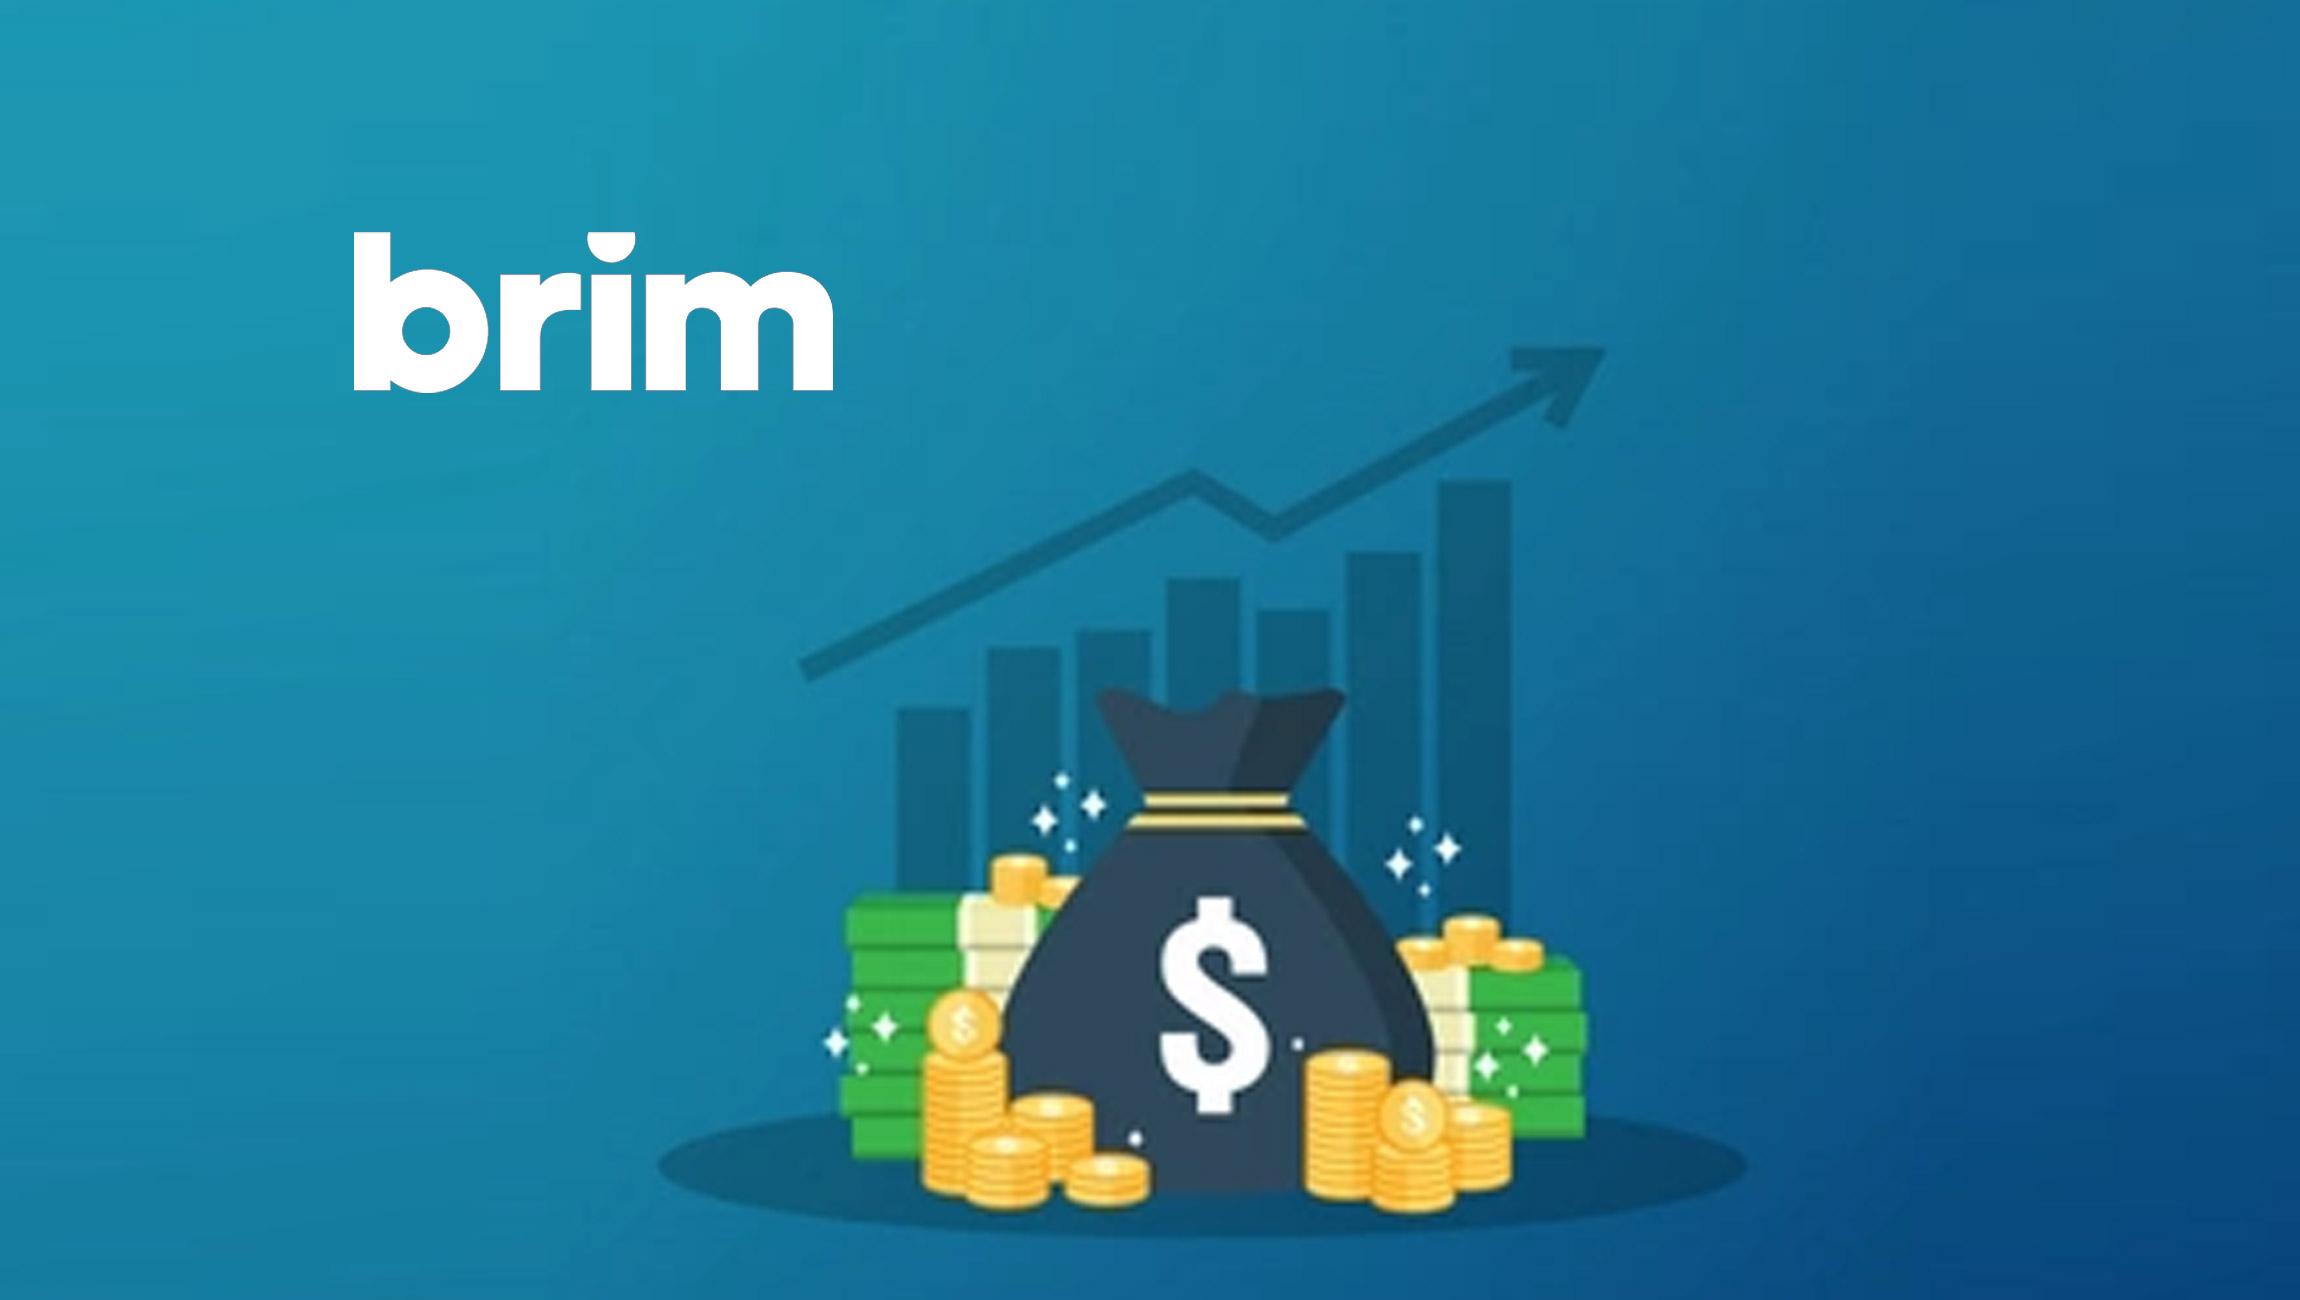 Brim Financial Raises $25M Series B to Transform the Way People Bank and Shop